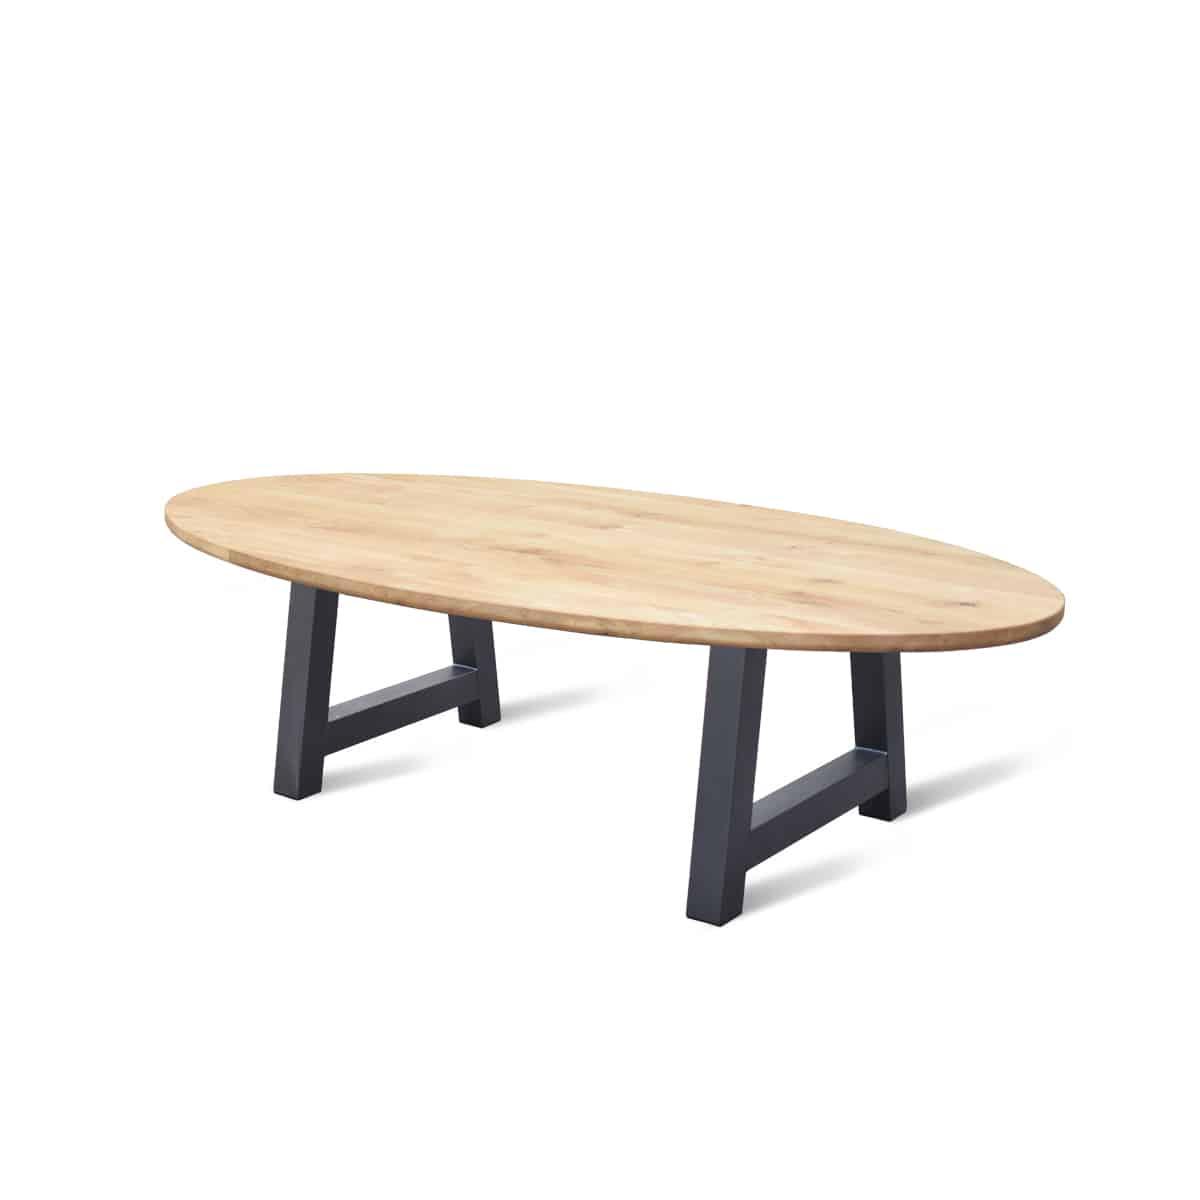 massief ovaal eiken houten industrieel tafel eetkamer keuken meubelmaker friesland